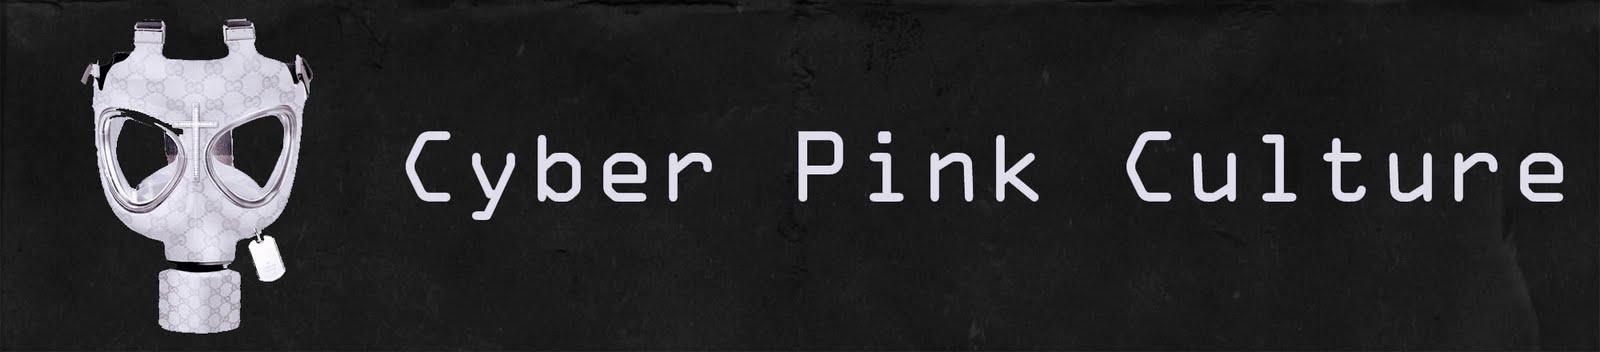 [Cyber Pink Culture]